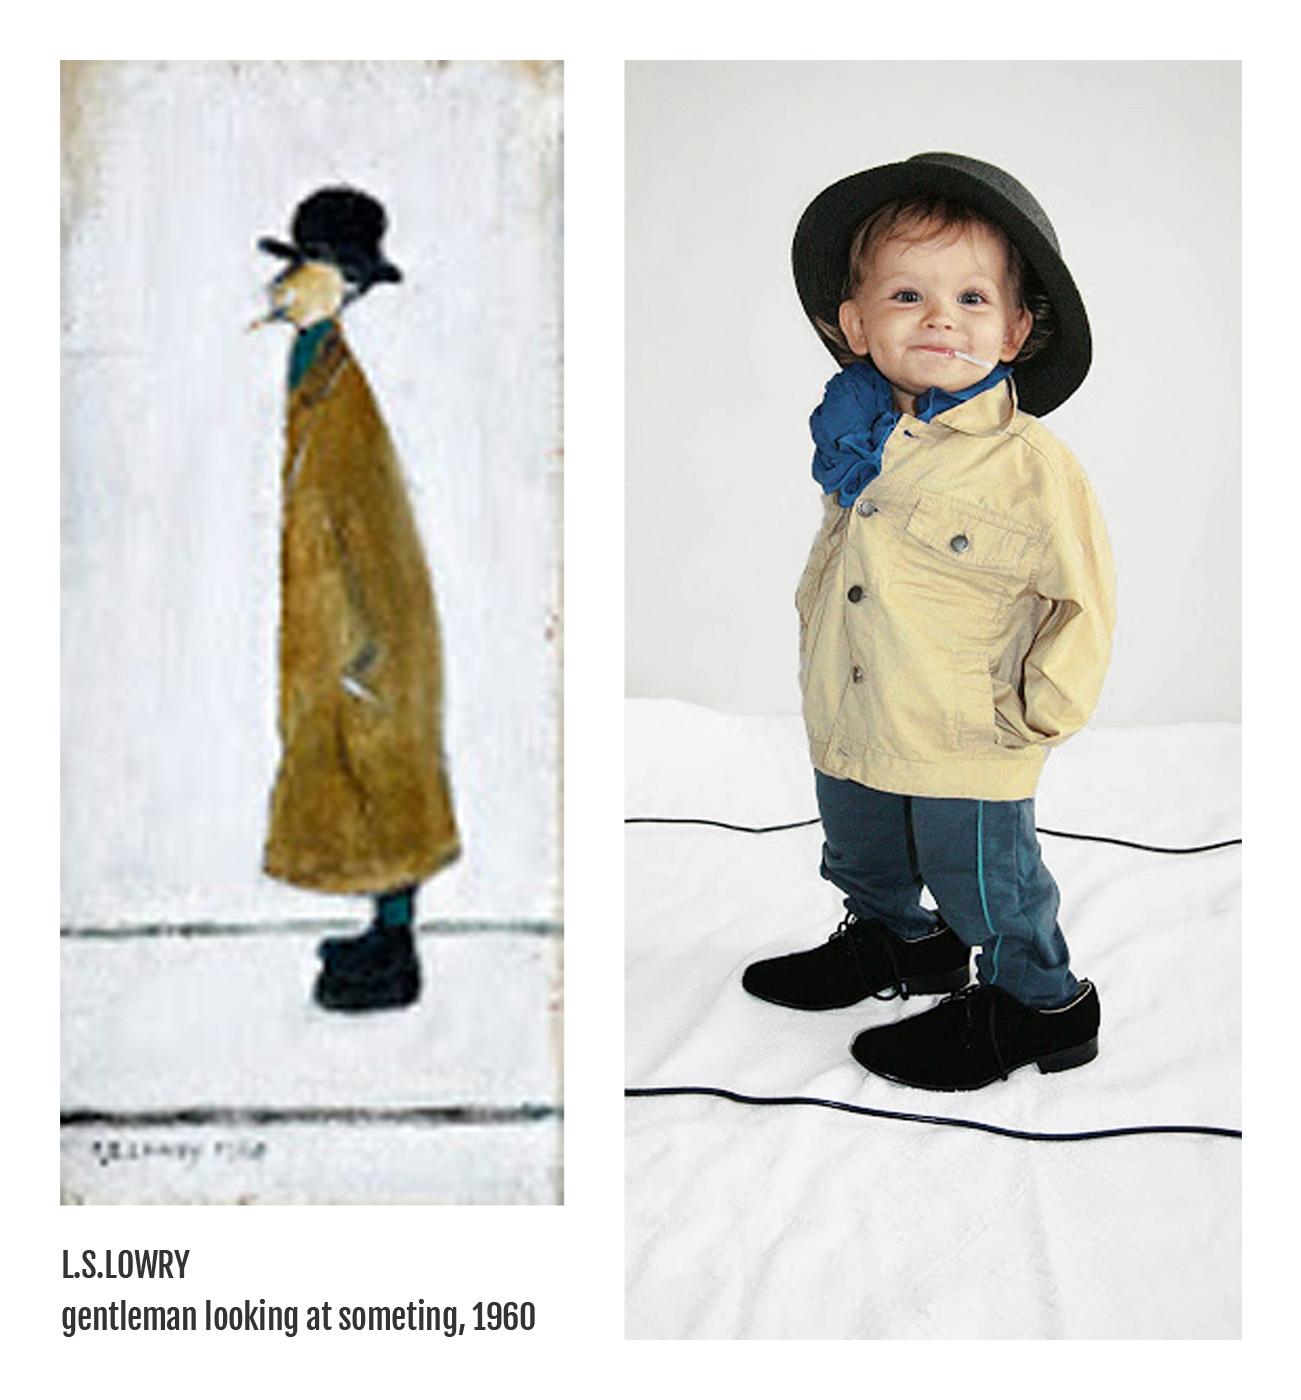 L.S.Lowry - Gentleman looking at something